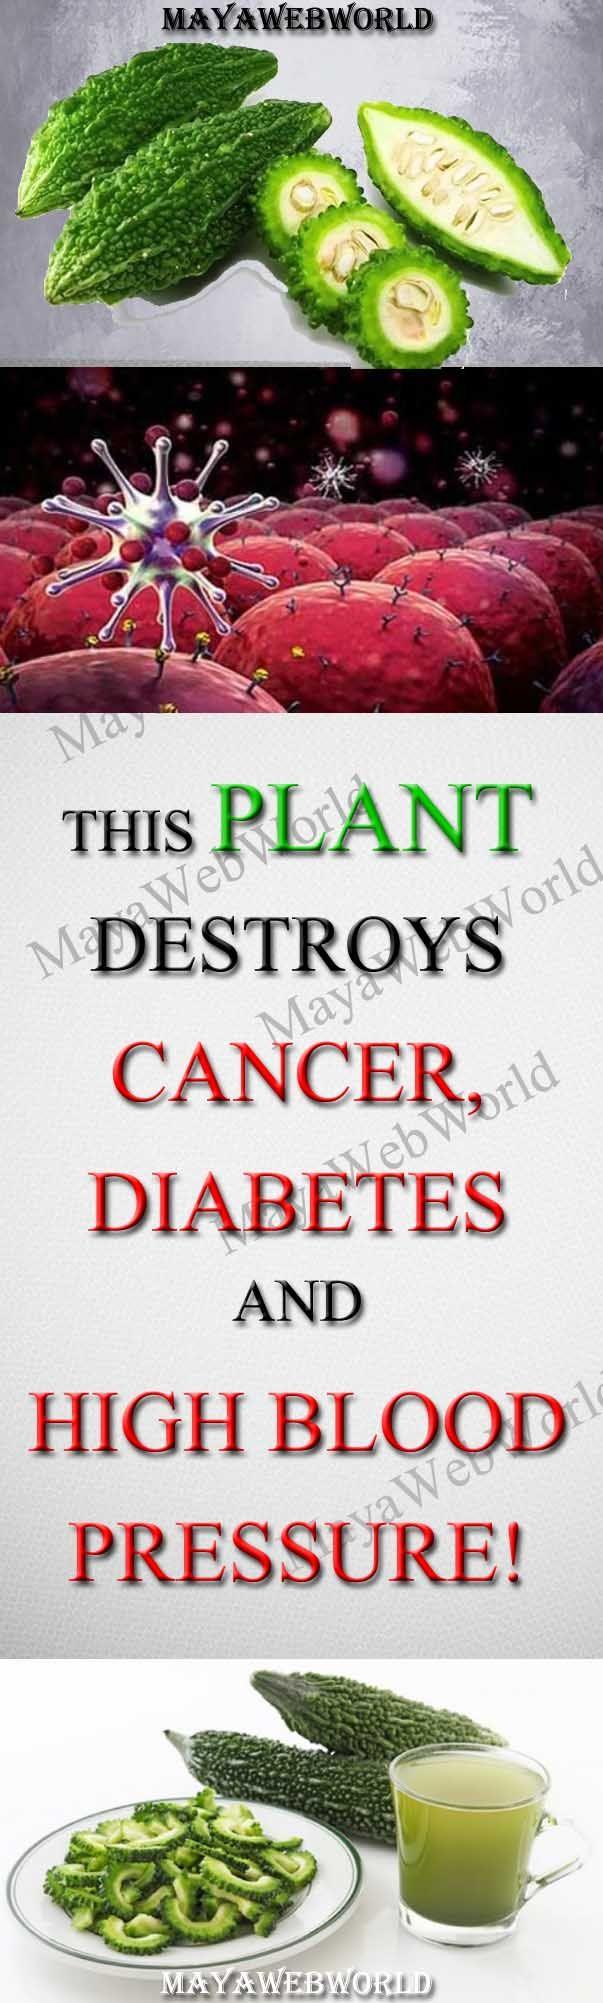 This plant destroys Cancer, Diabetes And High Blood Pressure! – MayaWebWorld